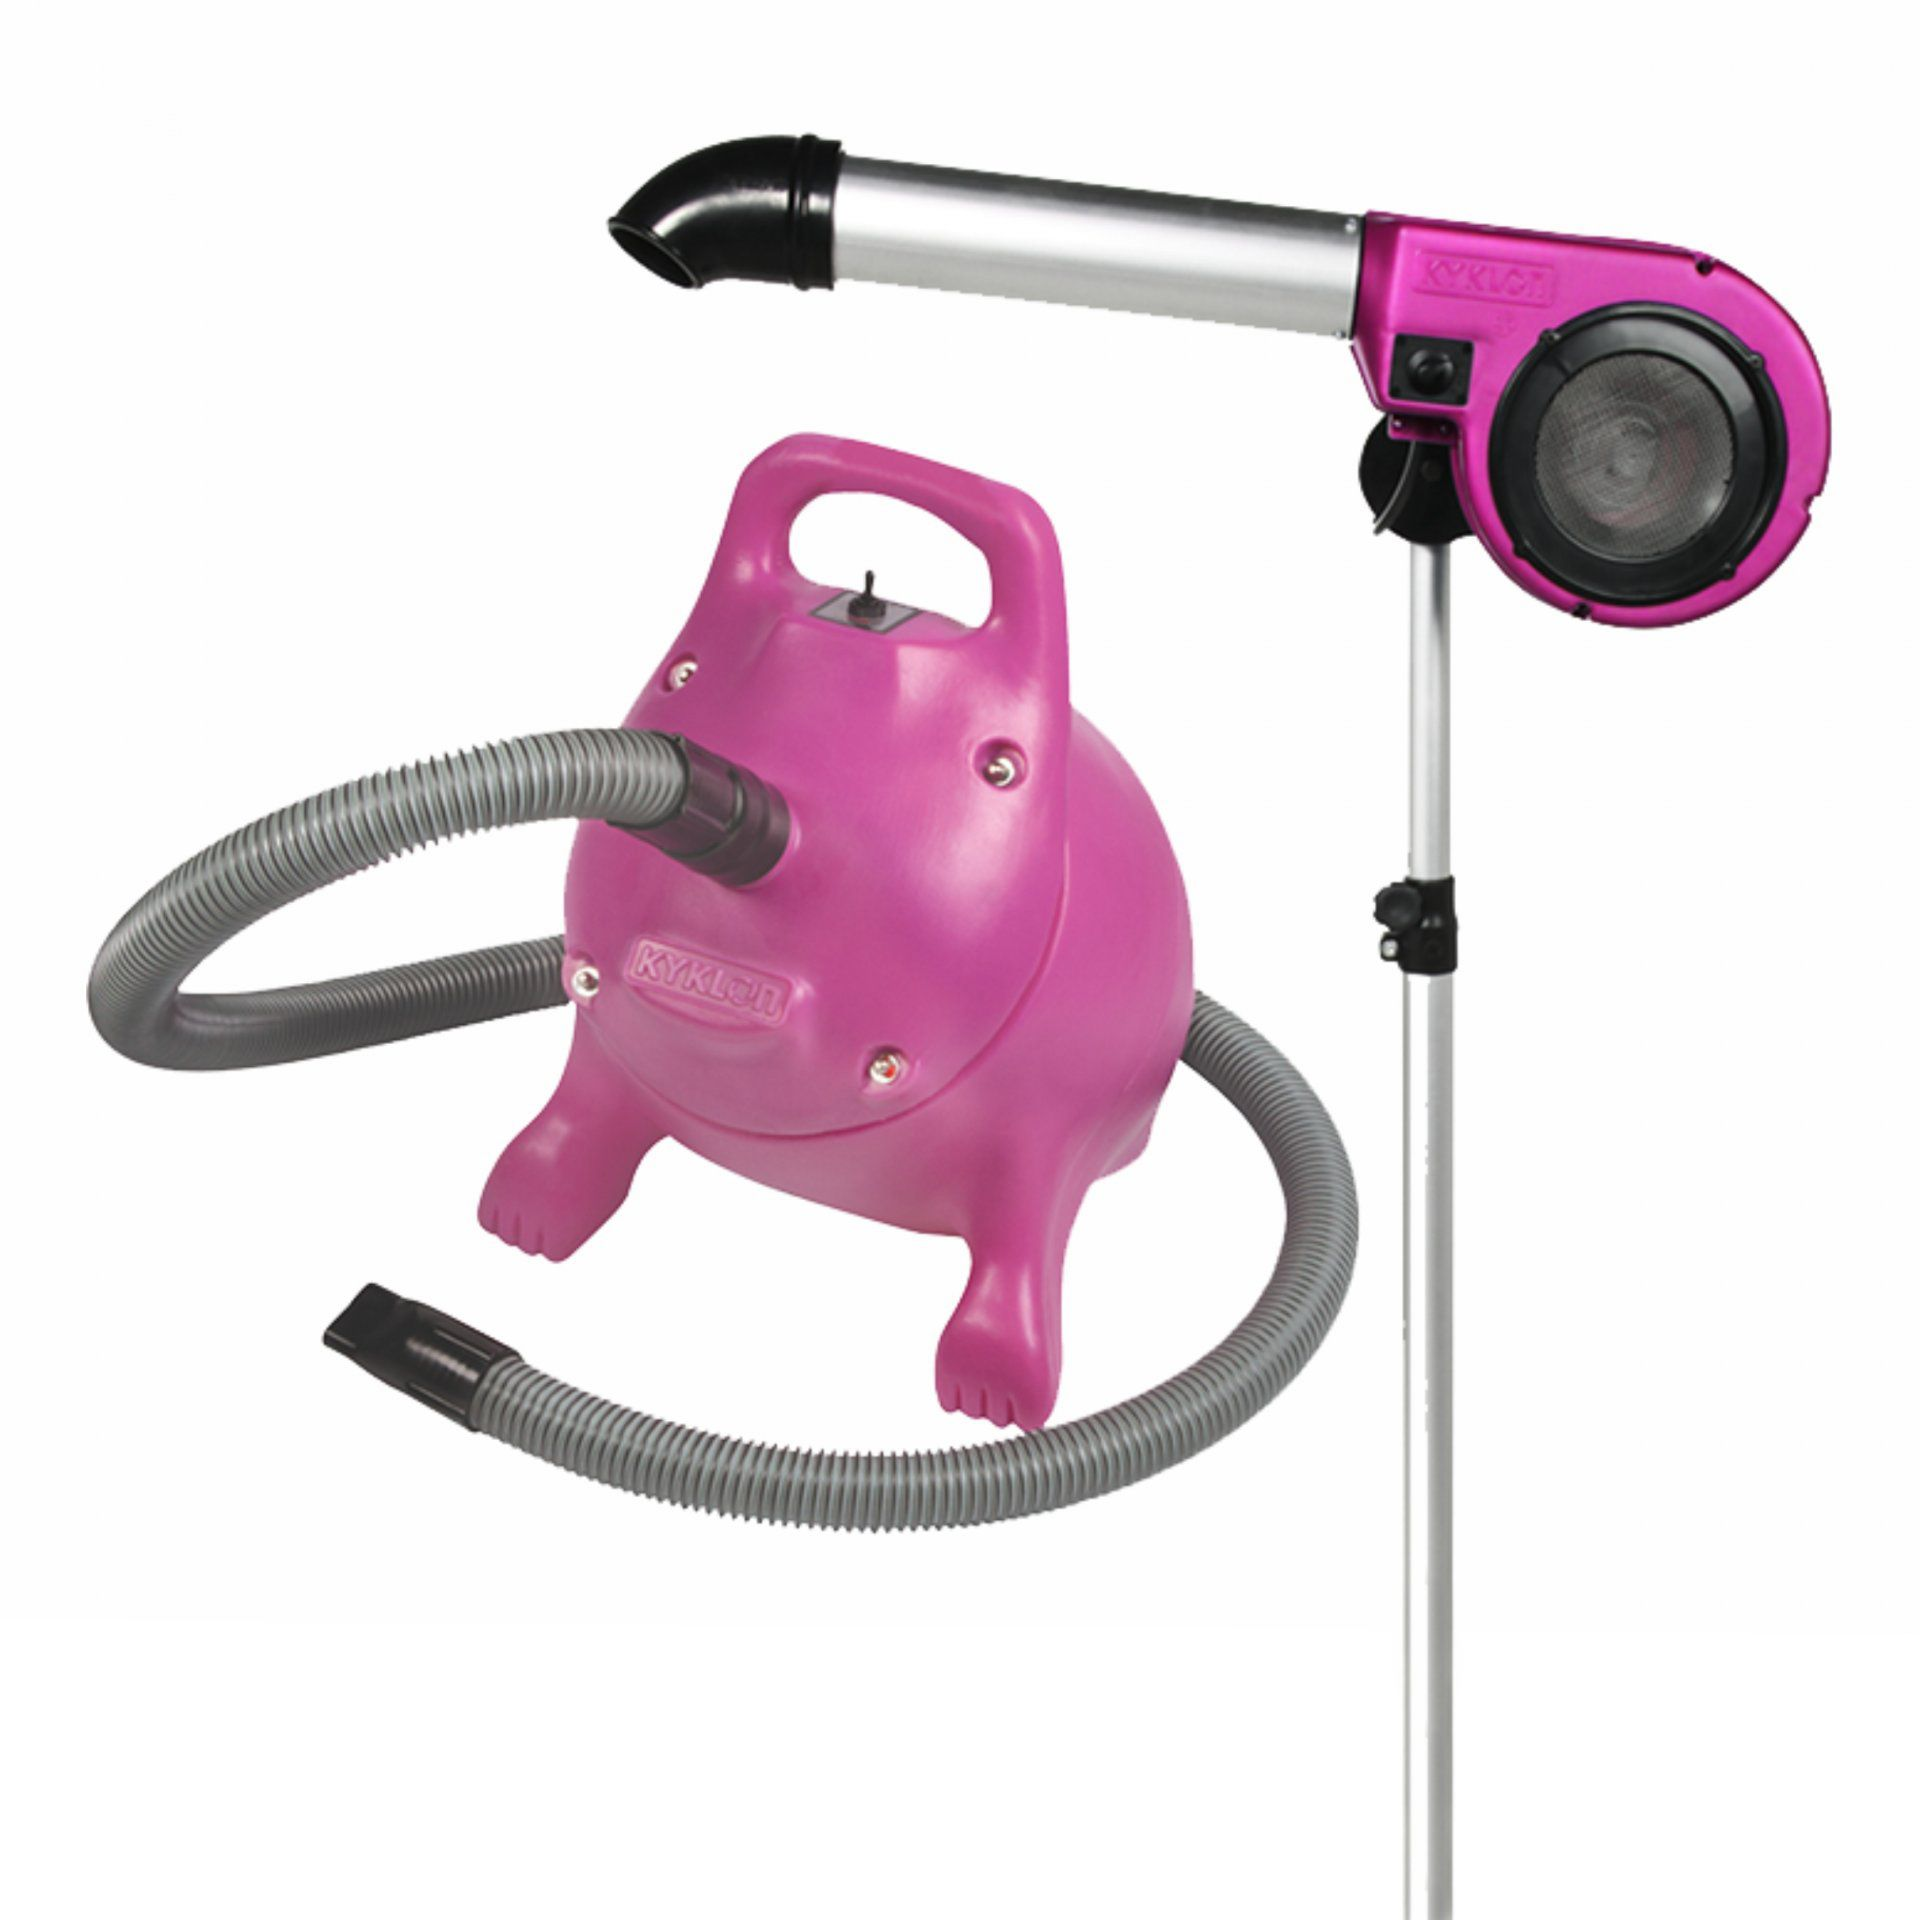 Secador de Pedestal Kyklon 5000 Pink + Soprador RX Pink - Combo